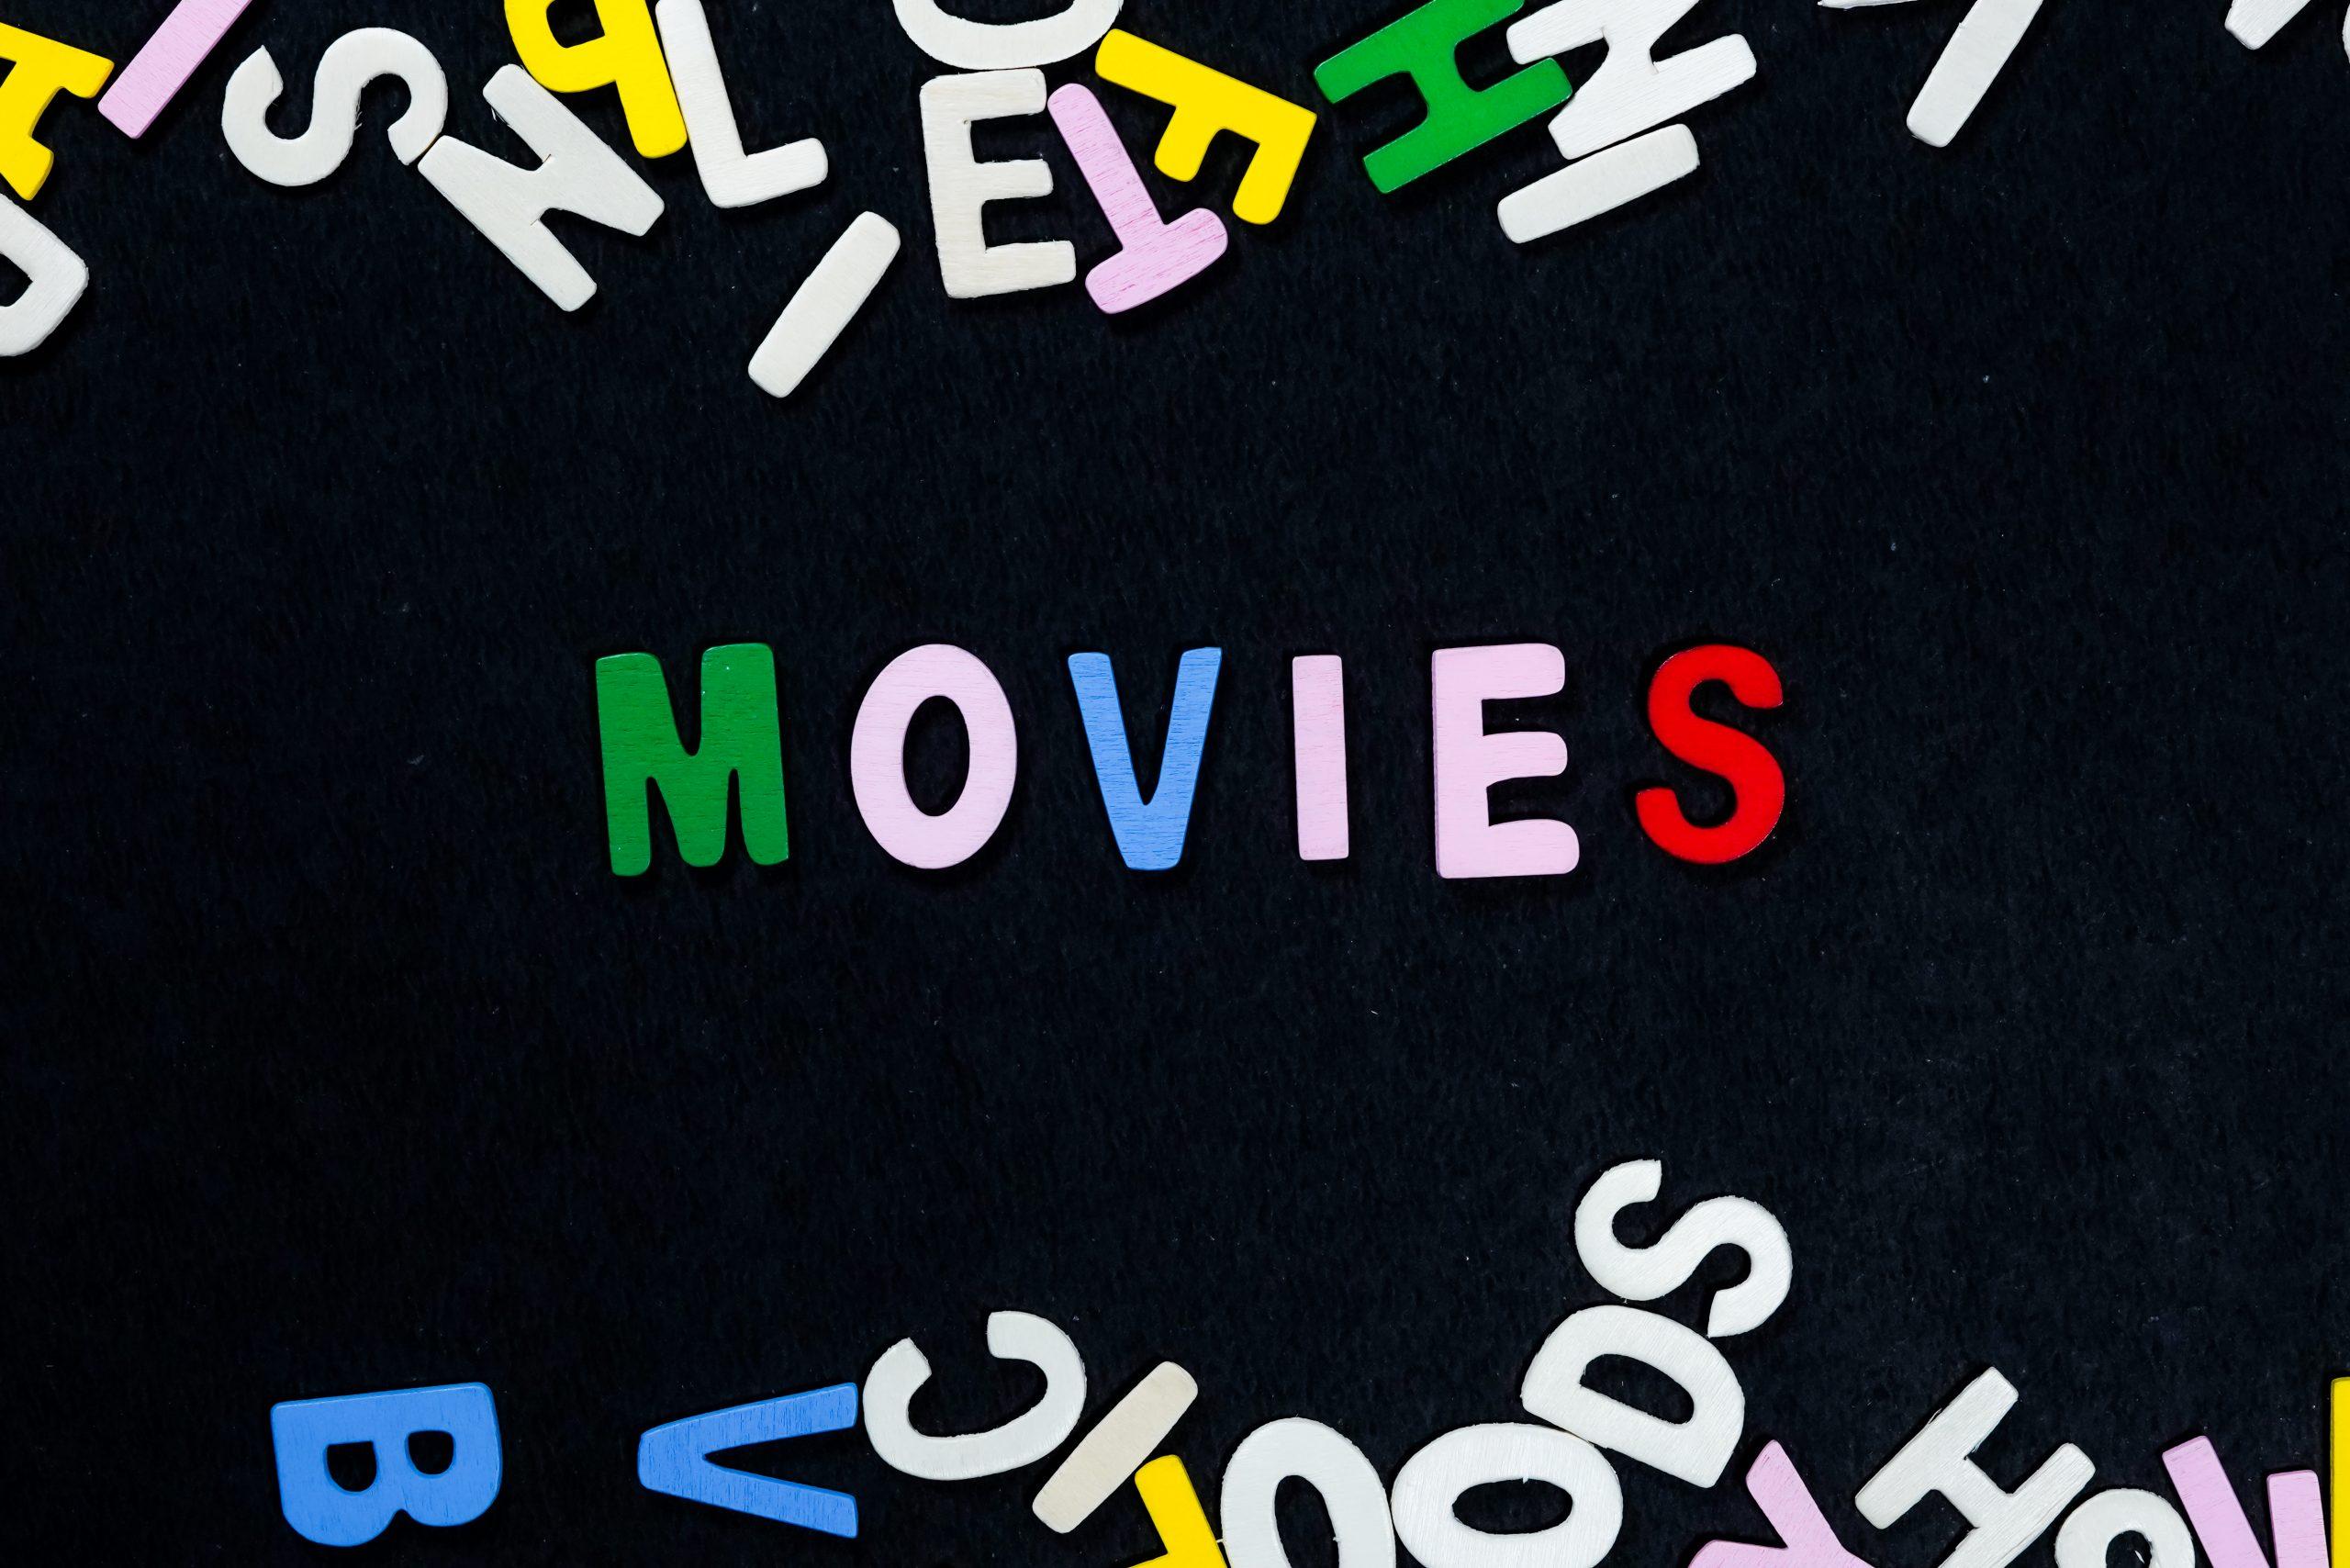 scrambled English letters